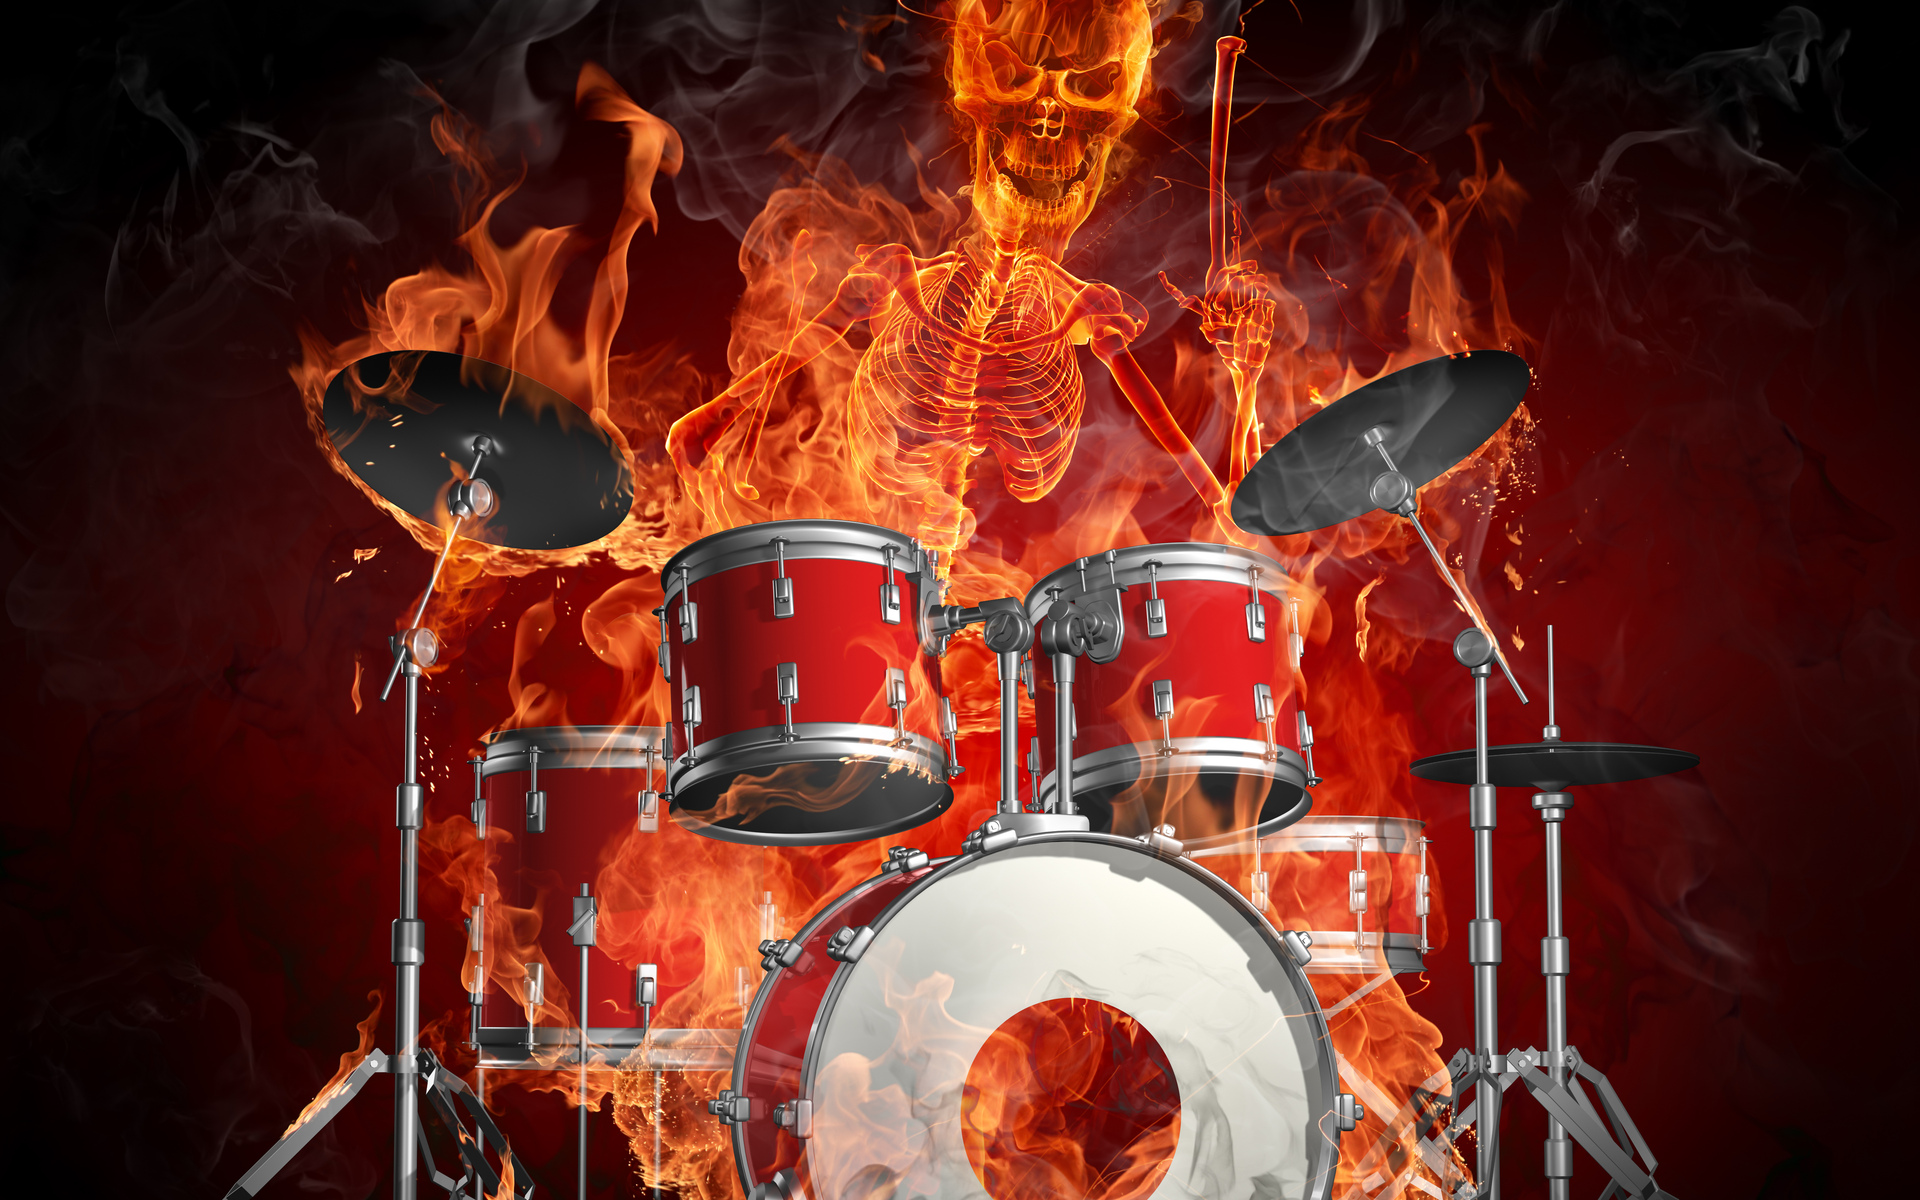 Flaming Guitars Digital Art Hd Wallpaper: Flames Drums Fire Skeleton Dark Wallpaper